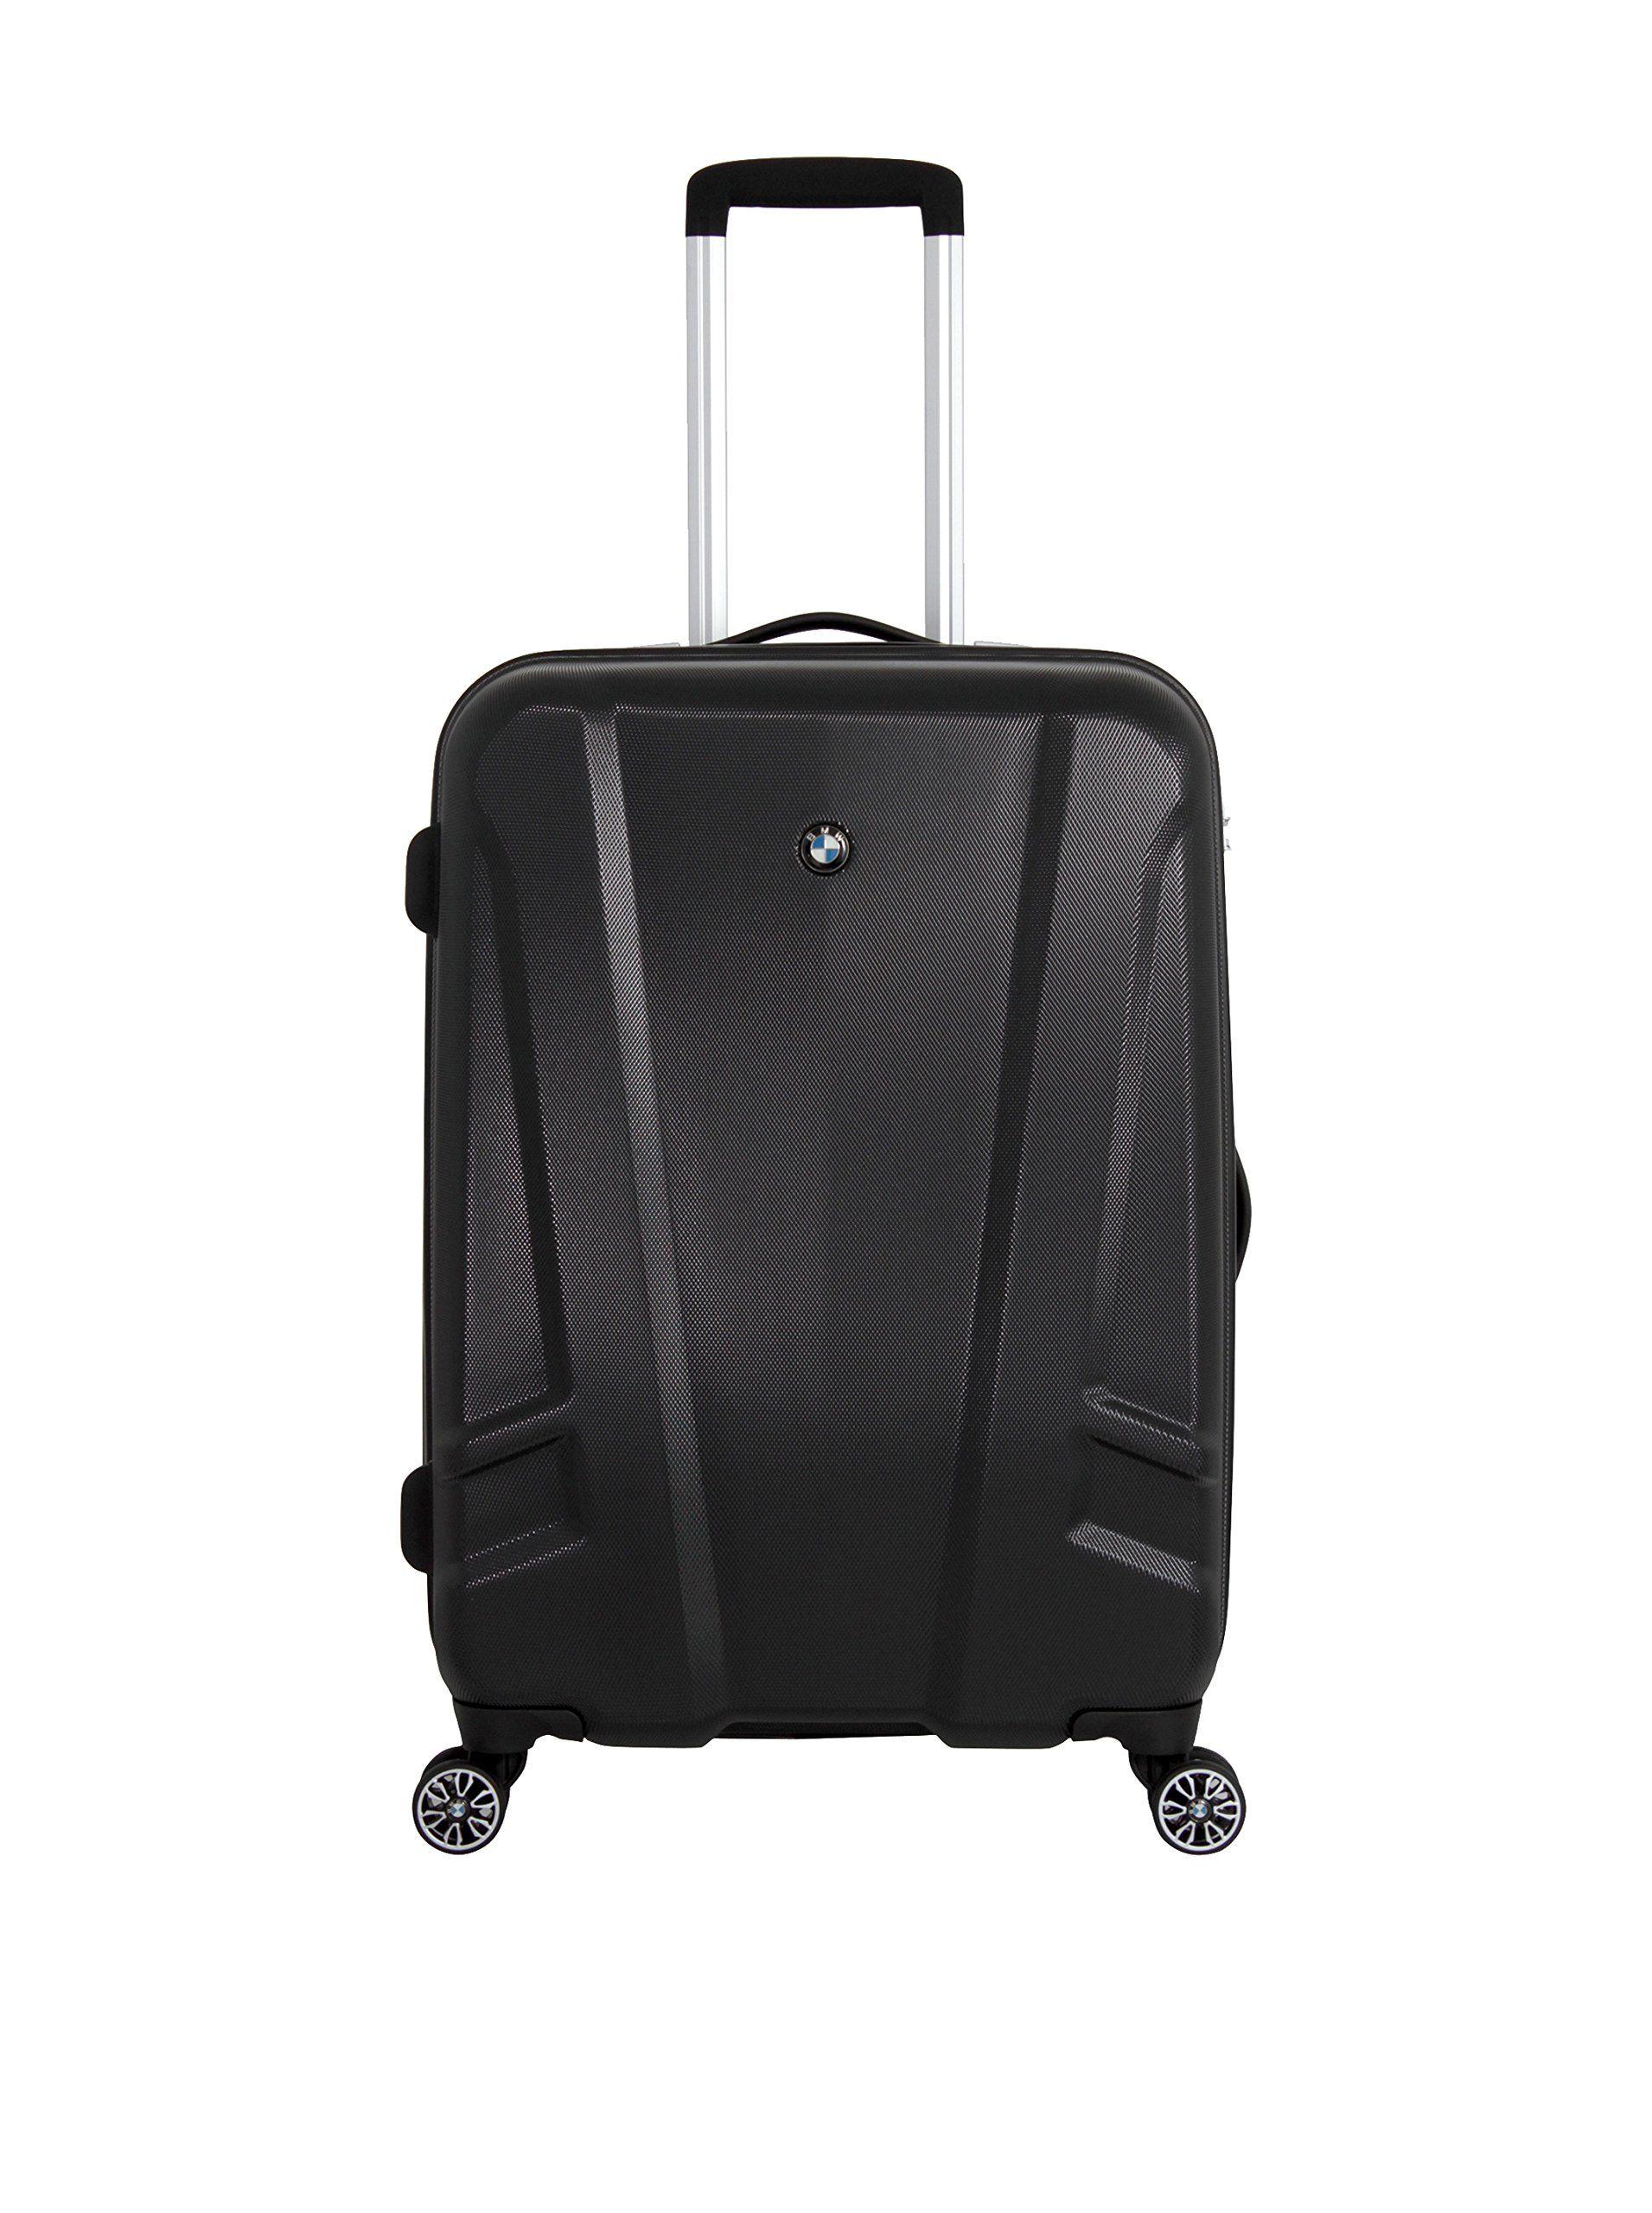 Bmw luggage 23 25 split case 8 wheel spinner black